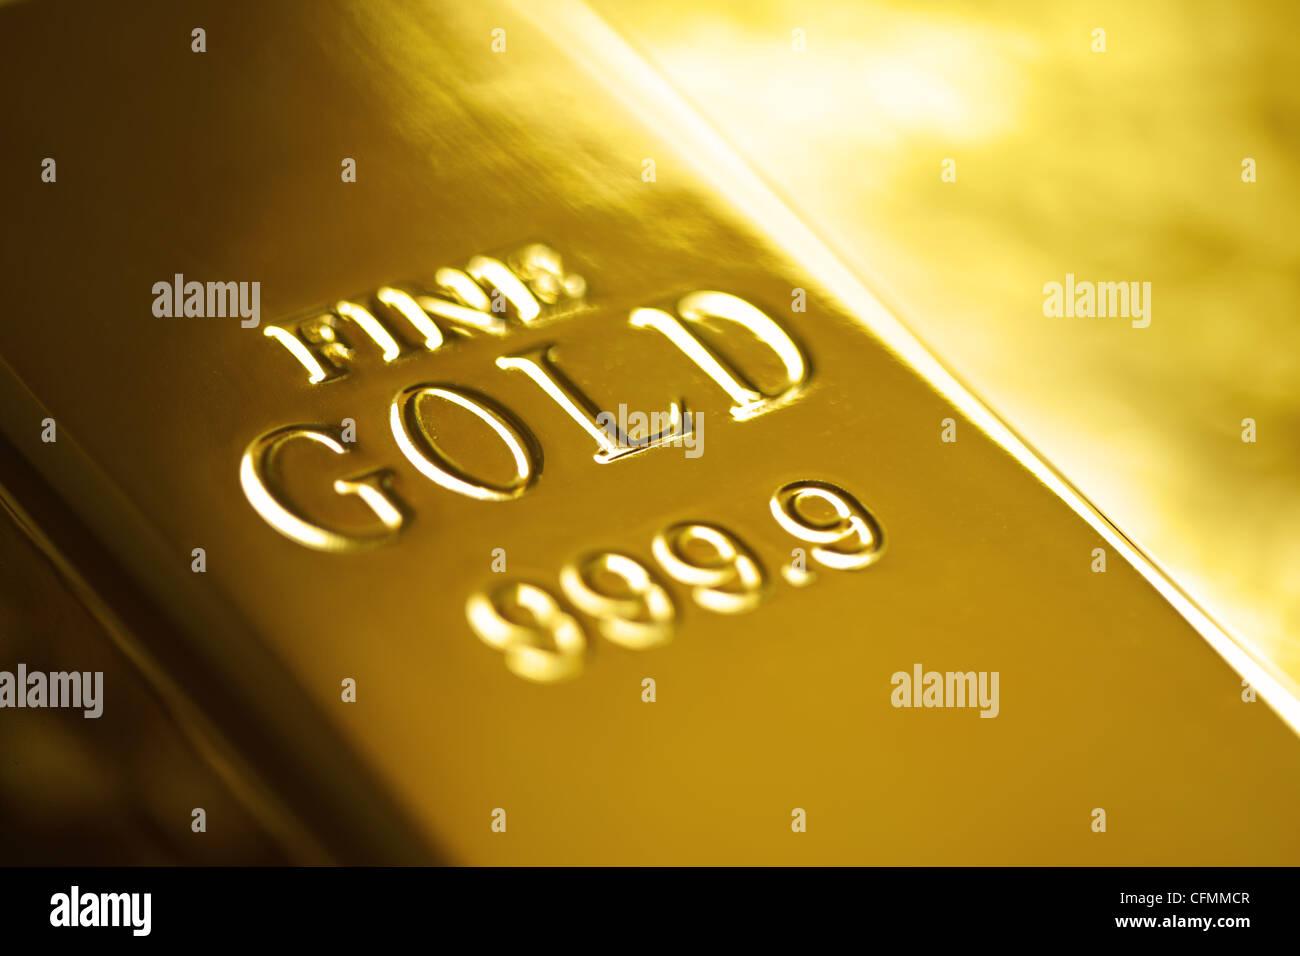 Lingote de oro Imagen De Stock